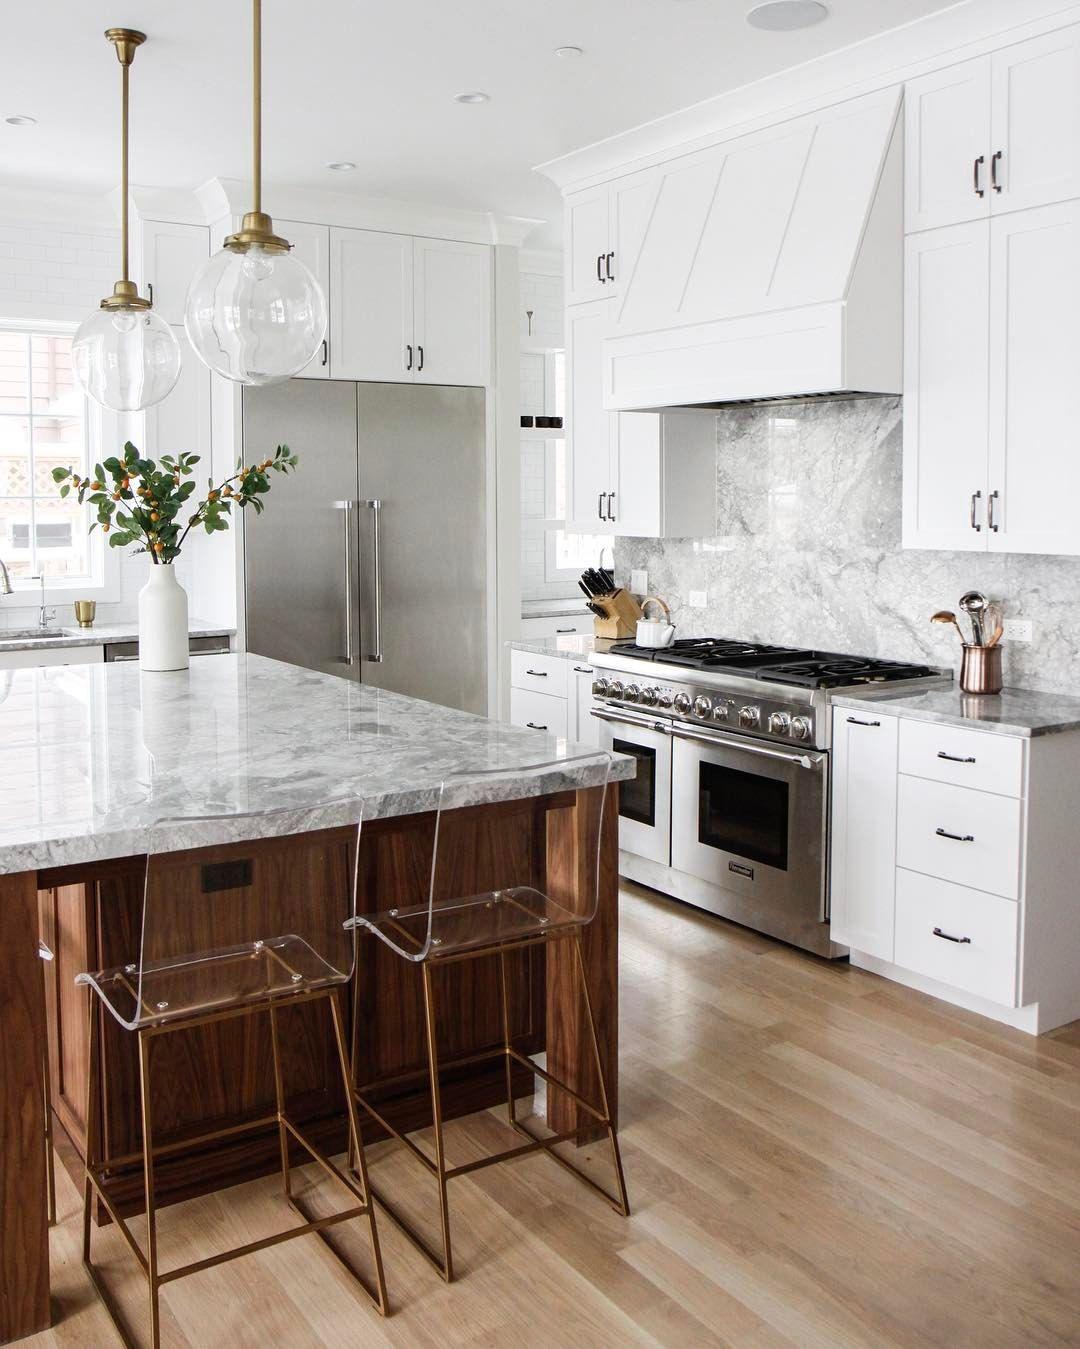 How To Brighten Up A Dark Wood Kitchen White Marble Kitchen With Gold And Wood Kitchen Interior Interior Design Kitchen Kitchen Inspirations